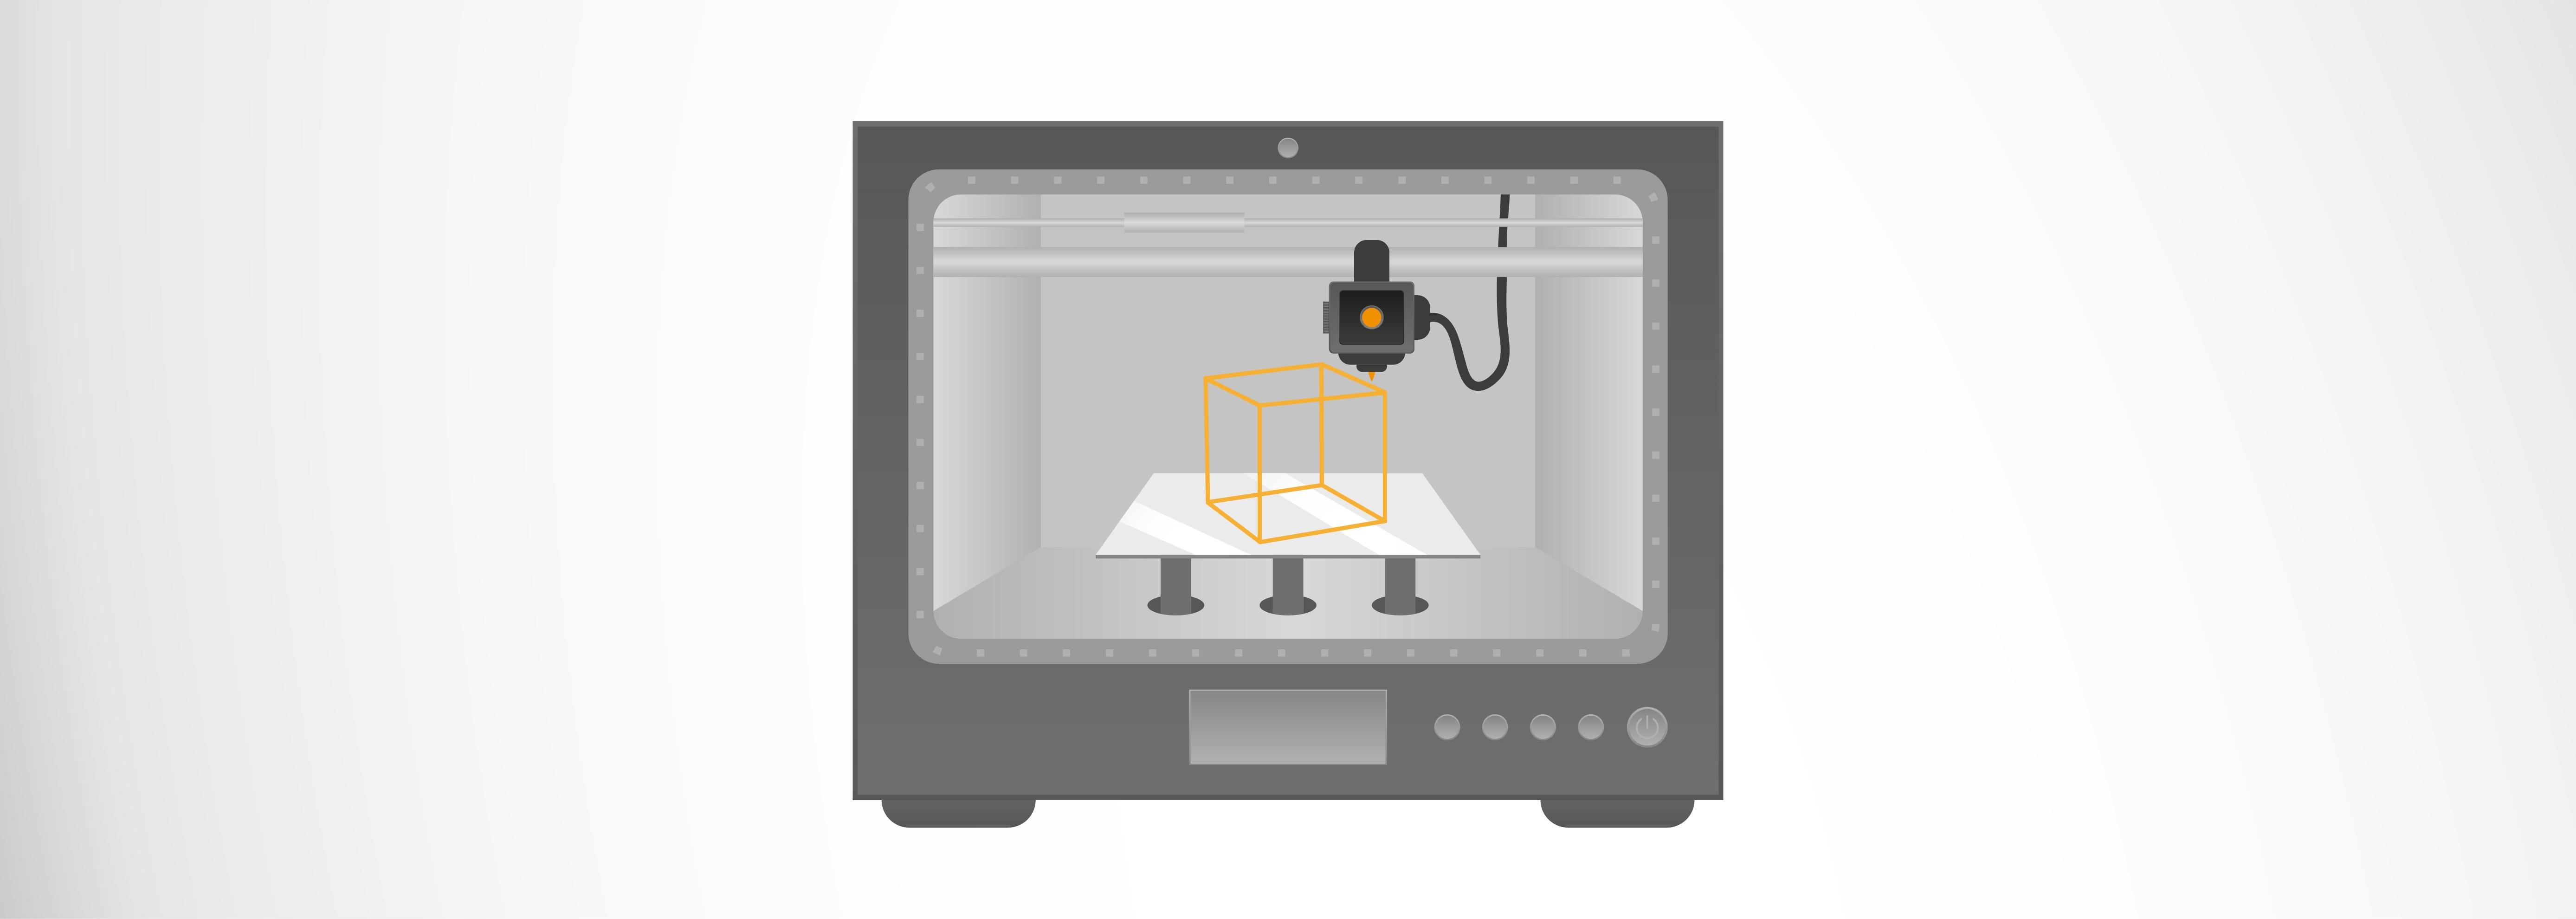 3dprint_on_glass_bed-1.jpg